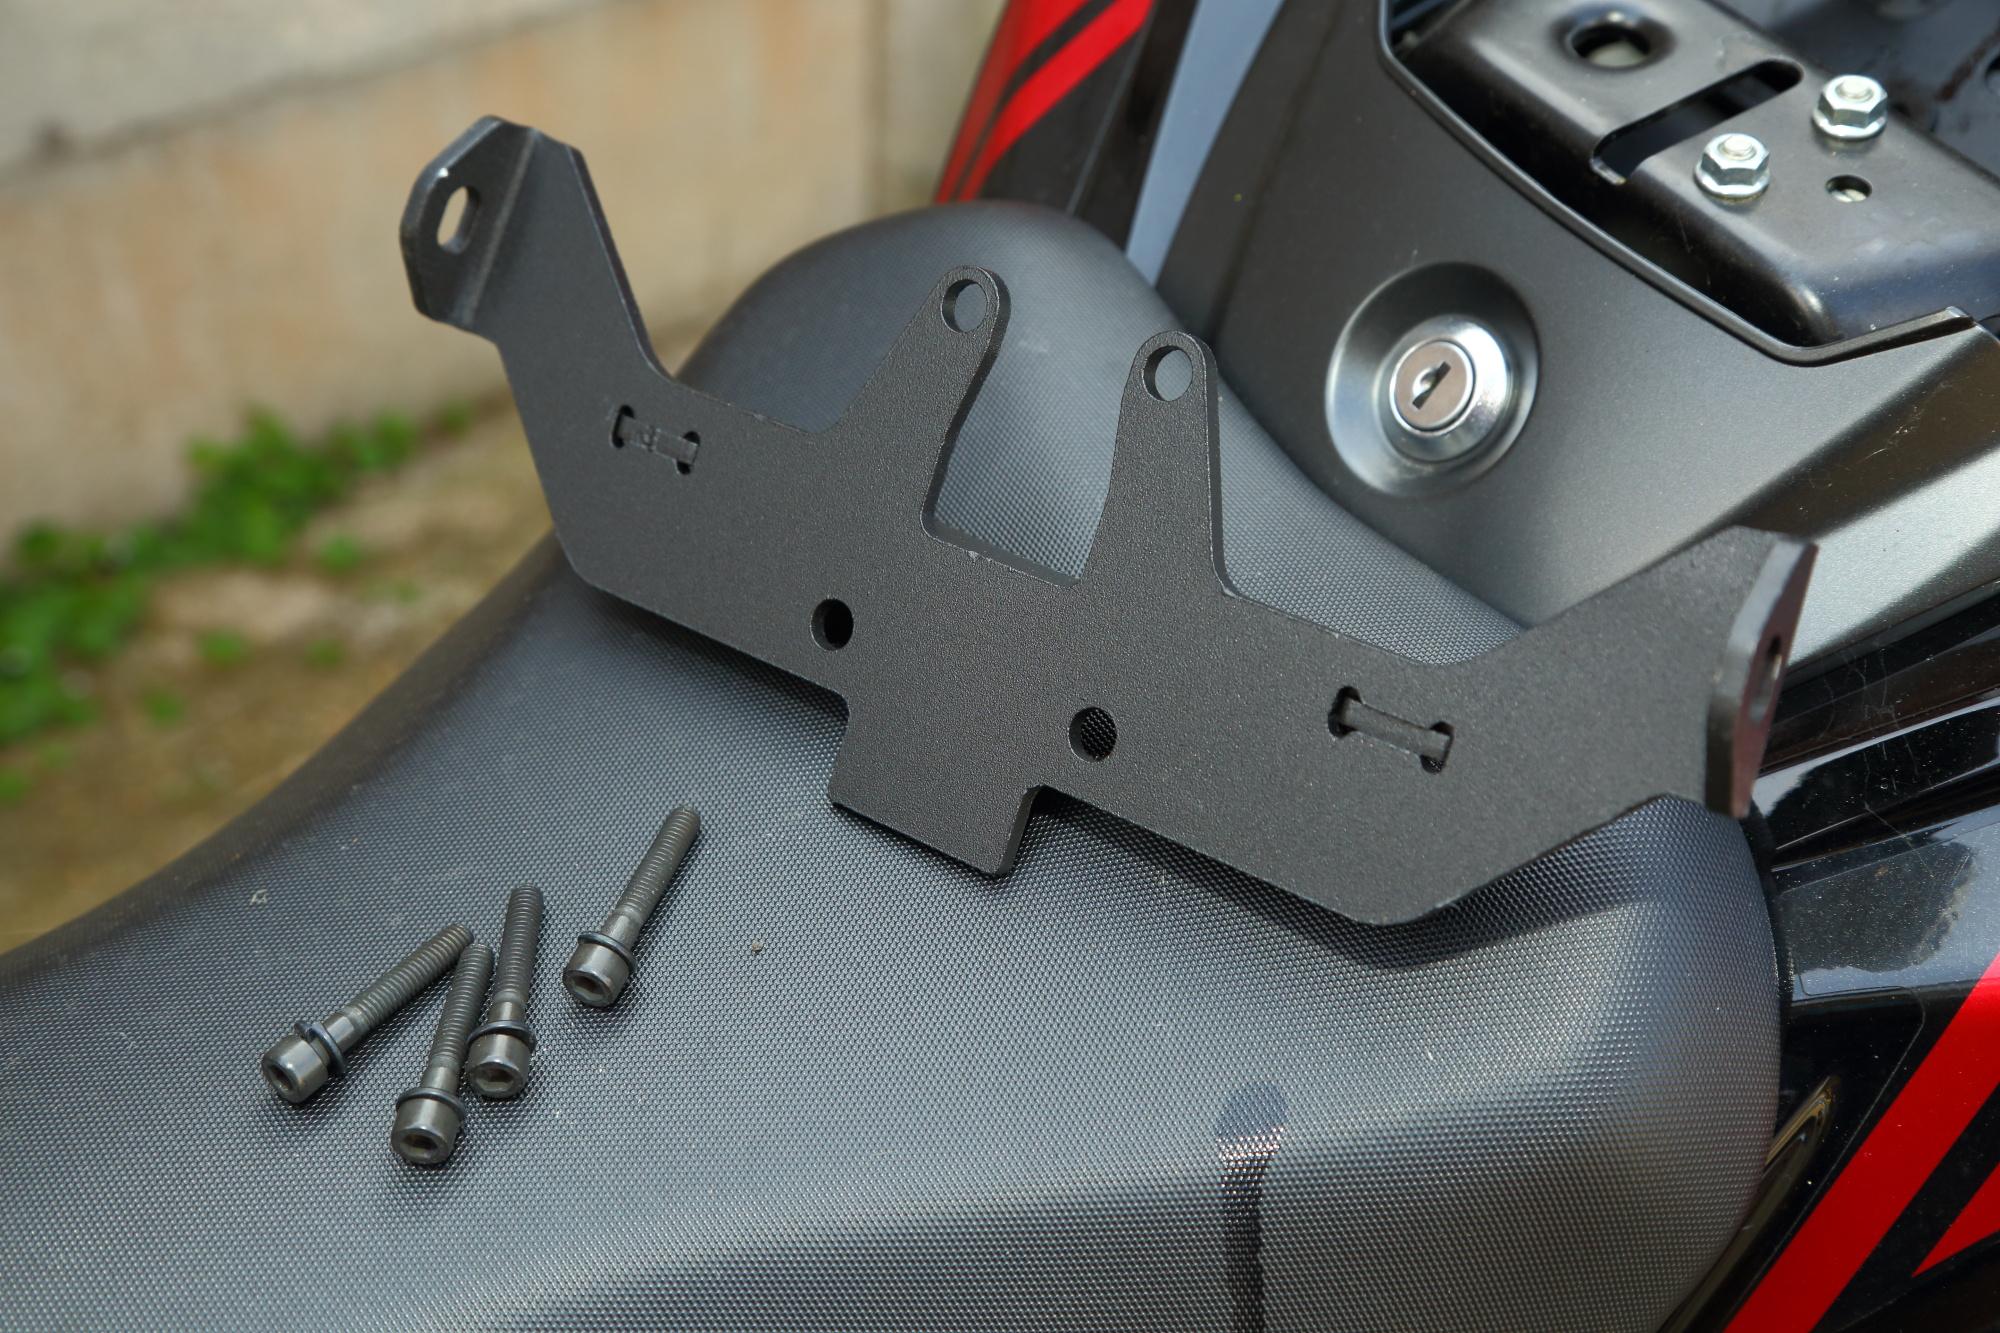 GSX-S750 Givi topbox fit